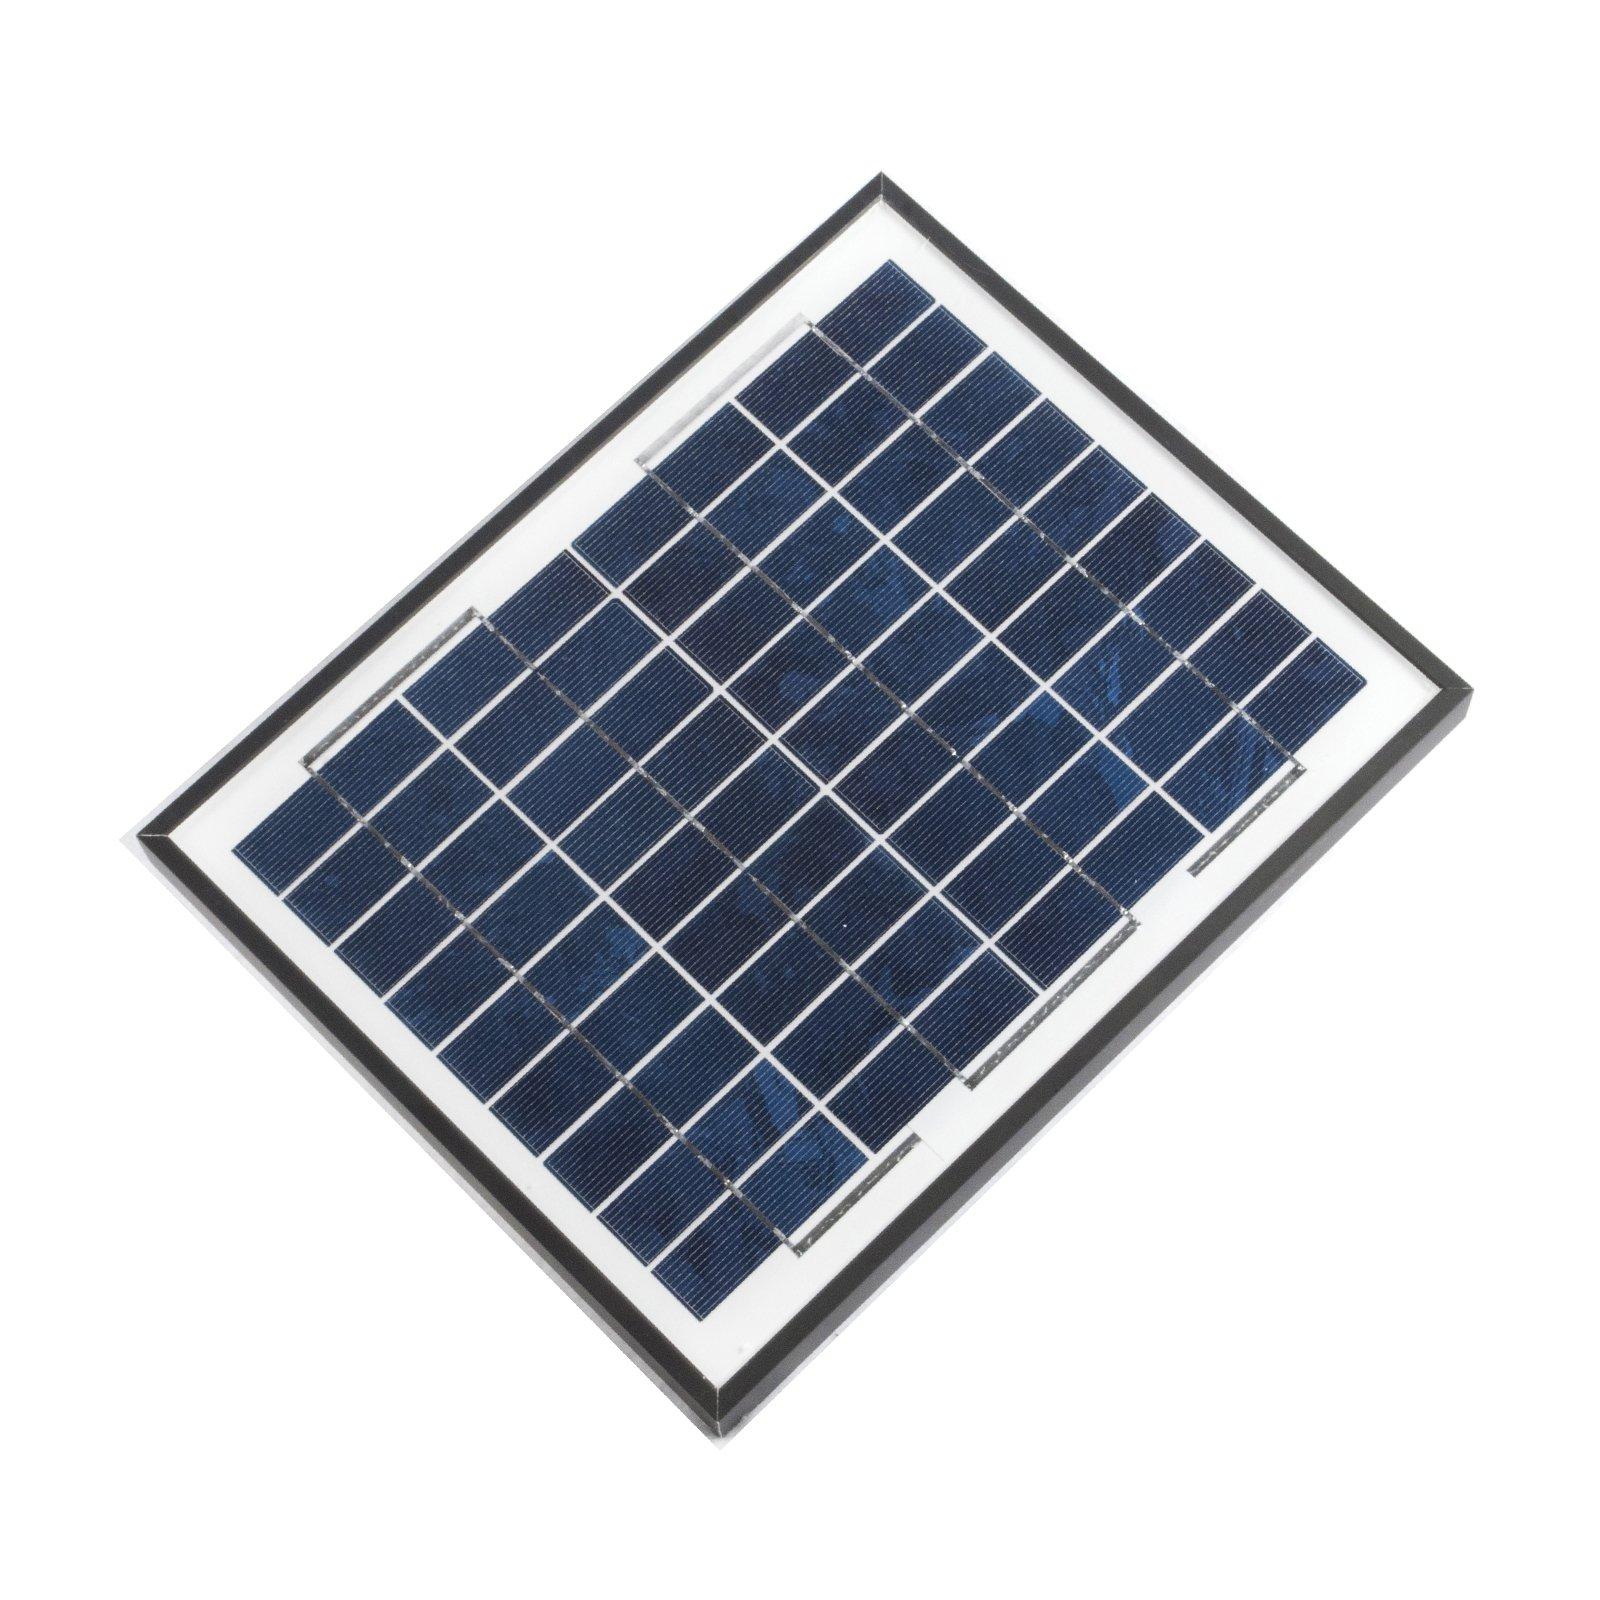 ALEKO SP10W12VP 10 Watt 12 Volt Polycrystalline Solar Panel for Gate Opener Pool Garden Driveway